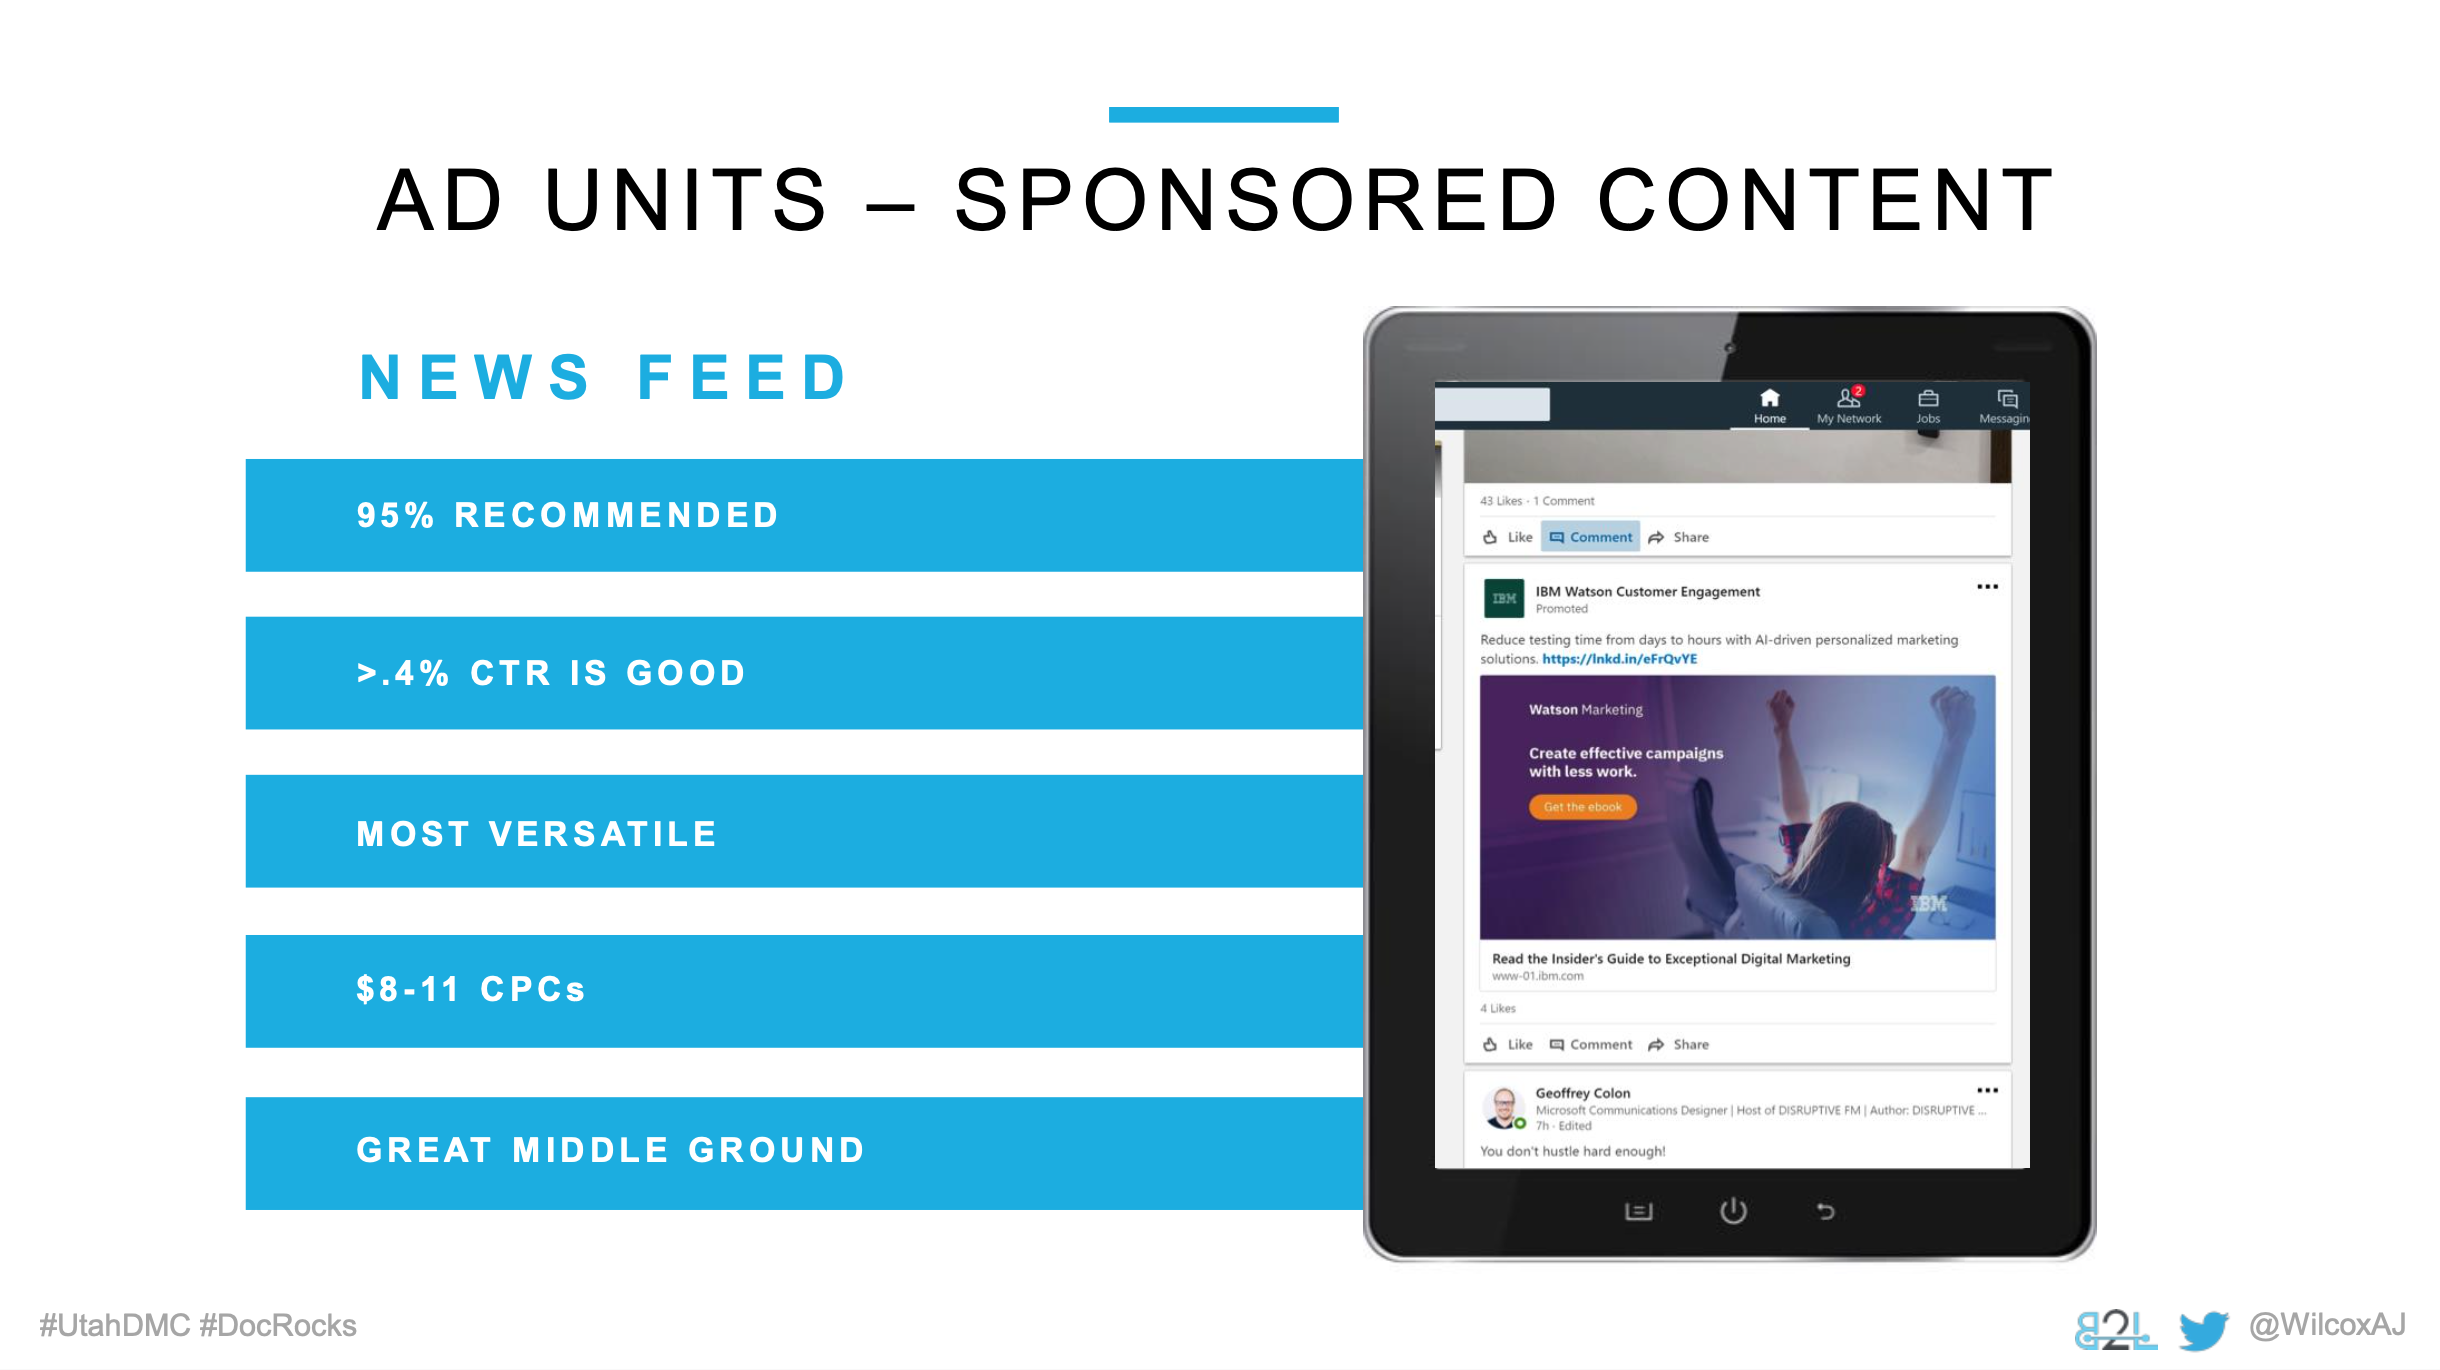 Utah DMC LinkedIn Ads - Aj Wilcox - Ad Units - Sponsored Content